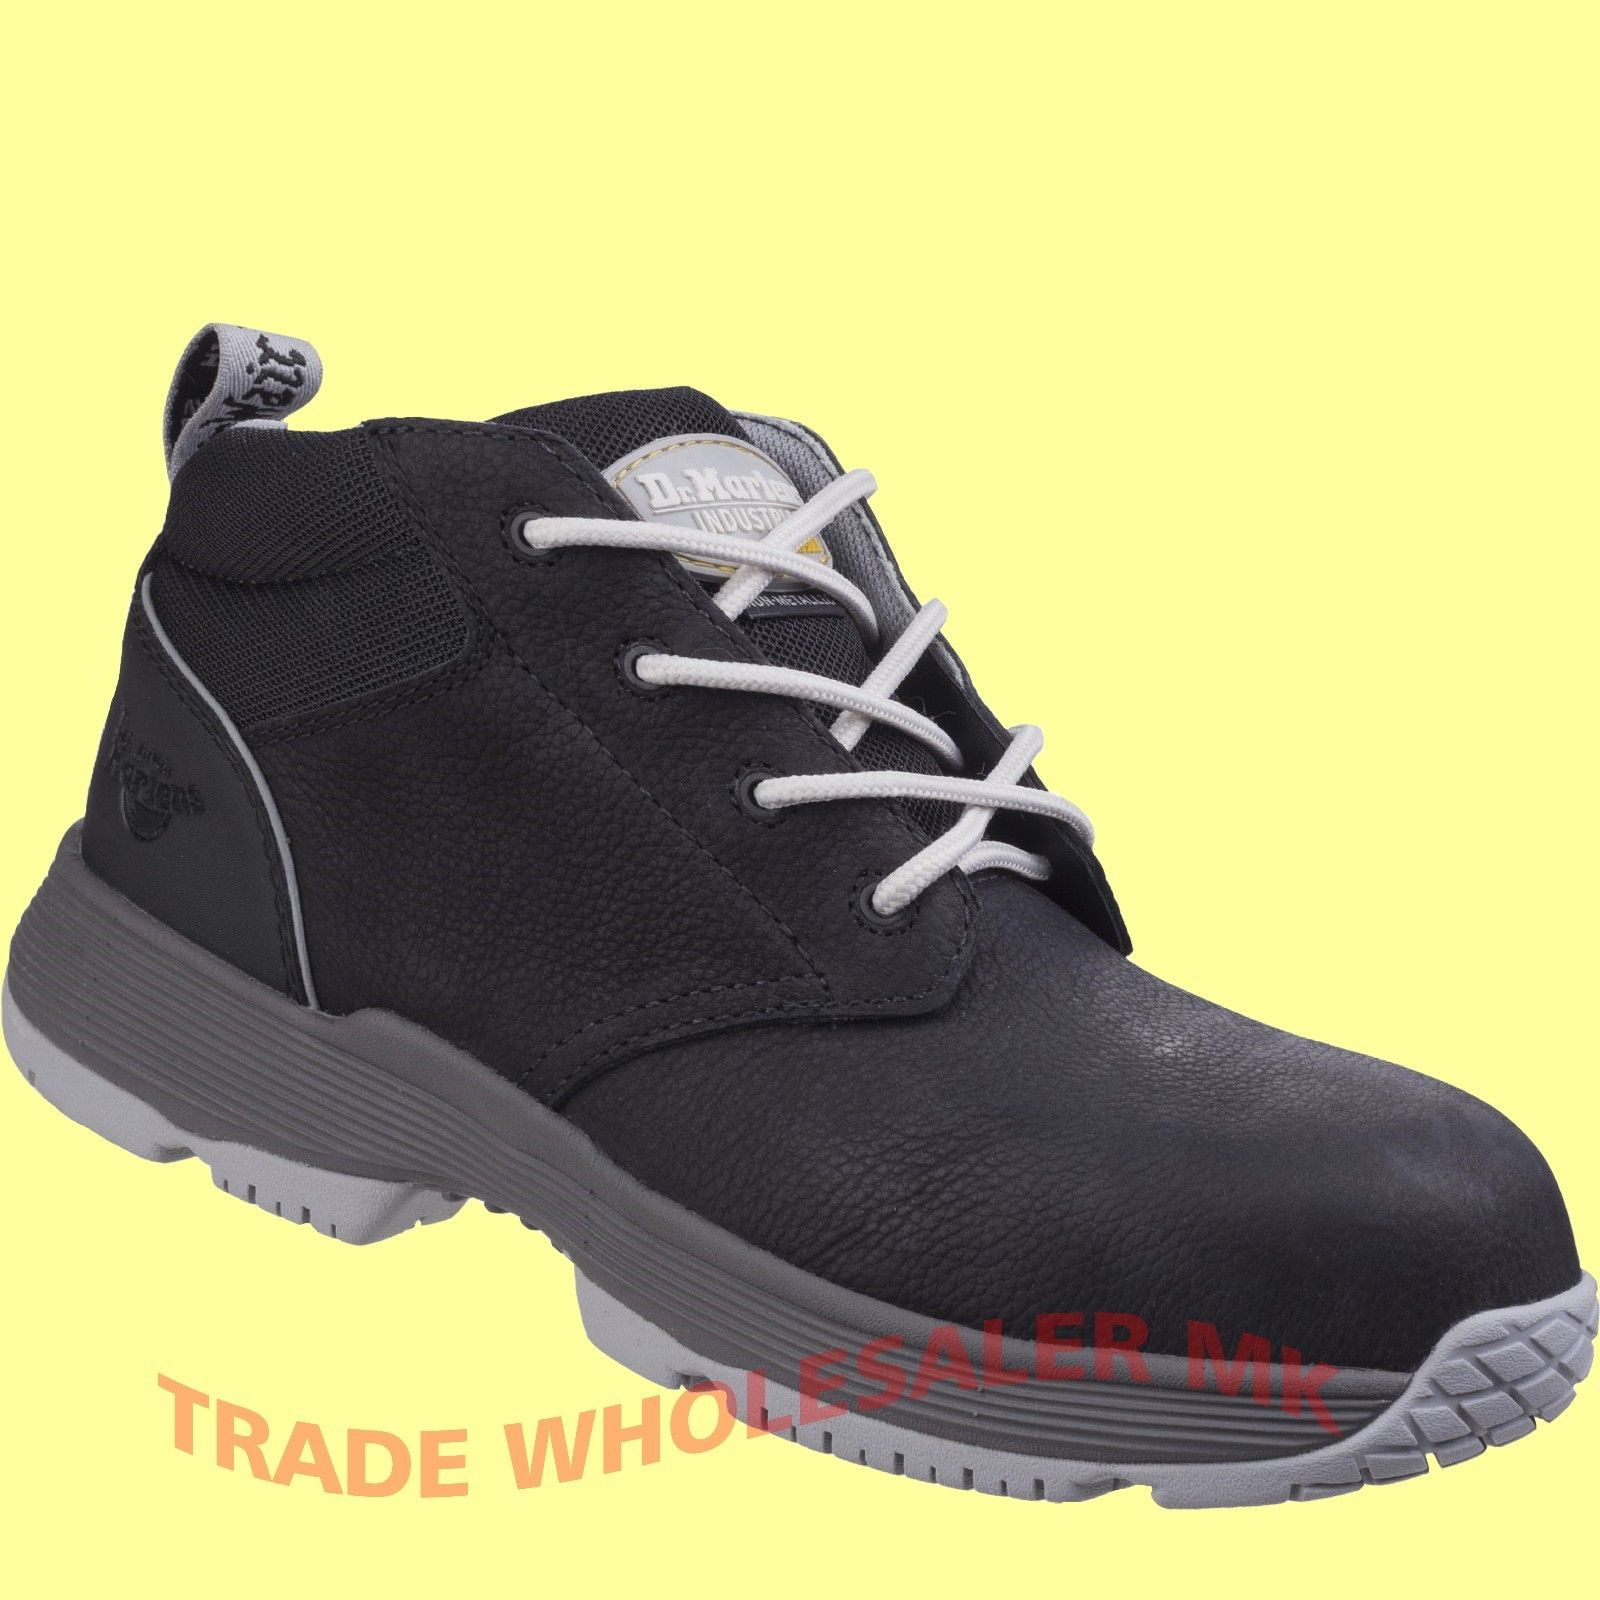 Ladies Doc Marten  Dr Martens Westfall  Safety Work Boots sizes 3-8